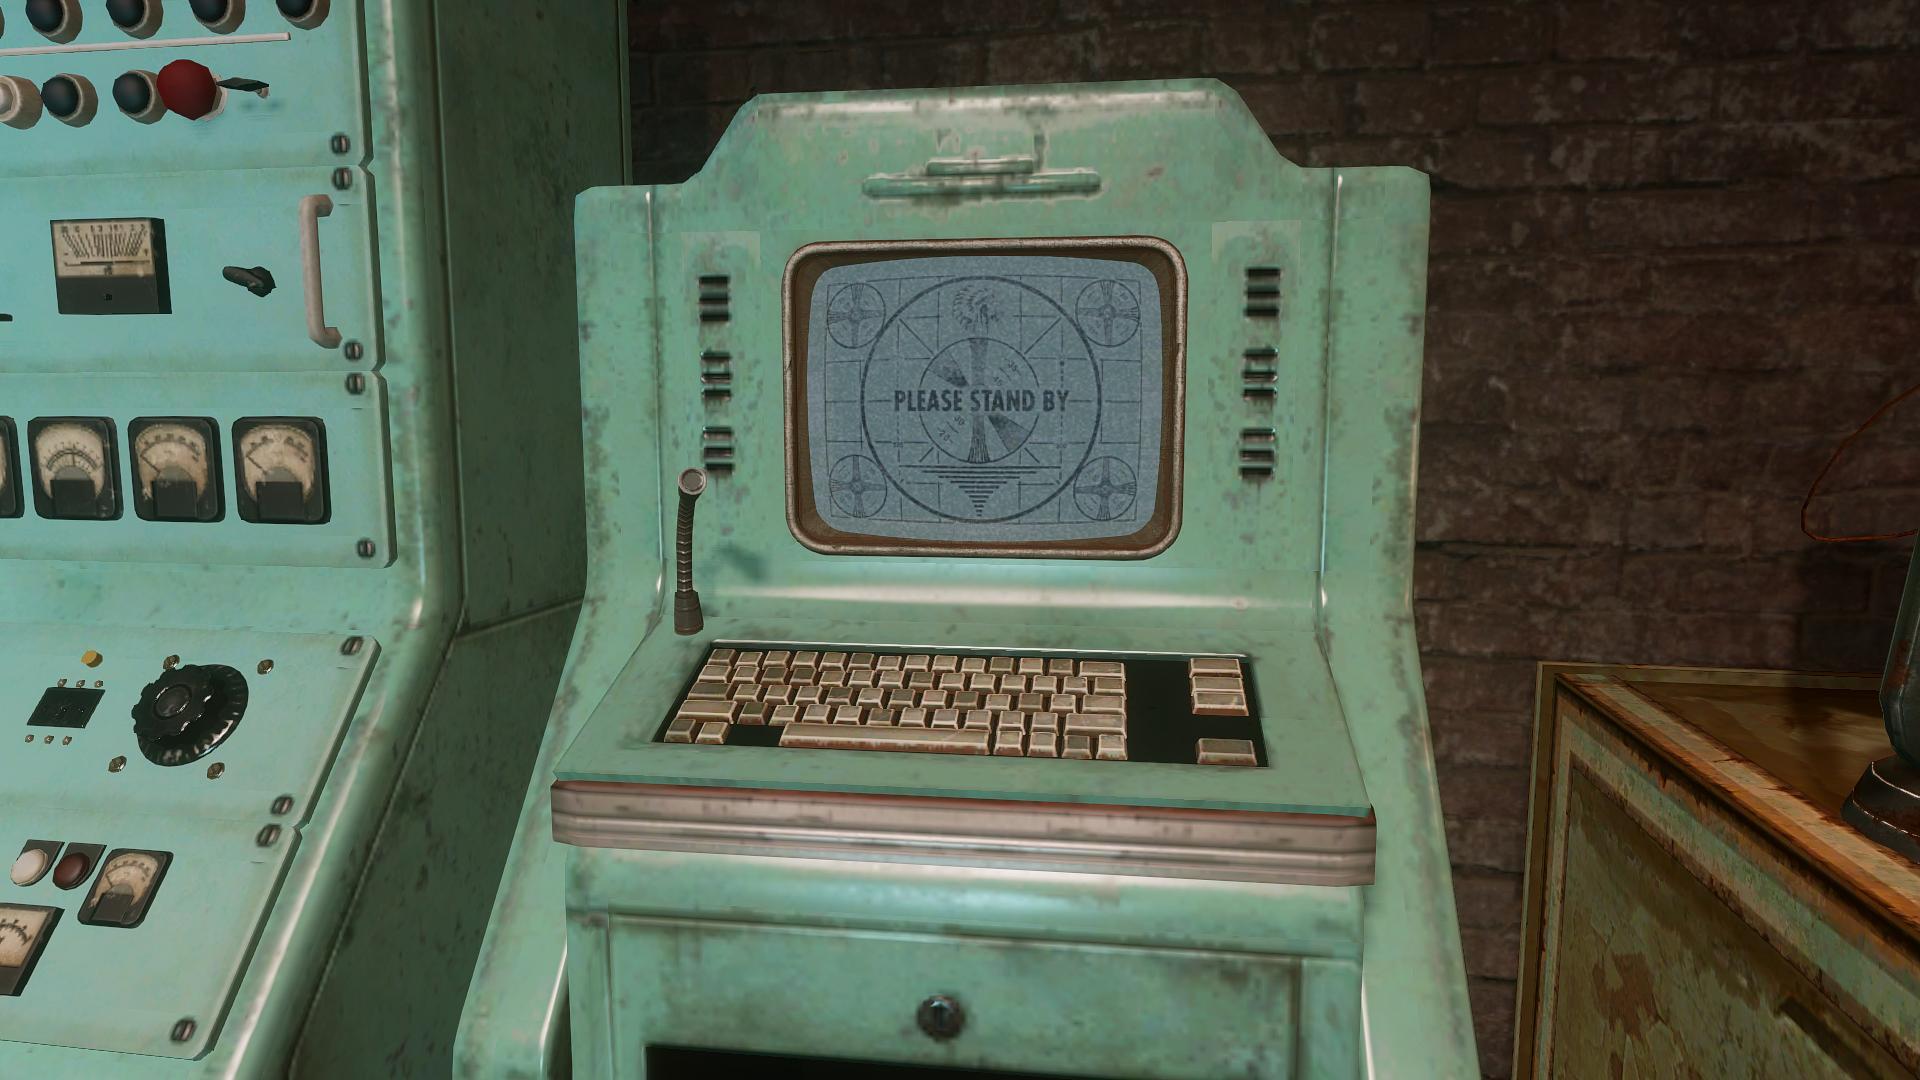 000240.Jpg - Fallout 4